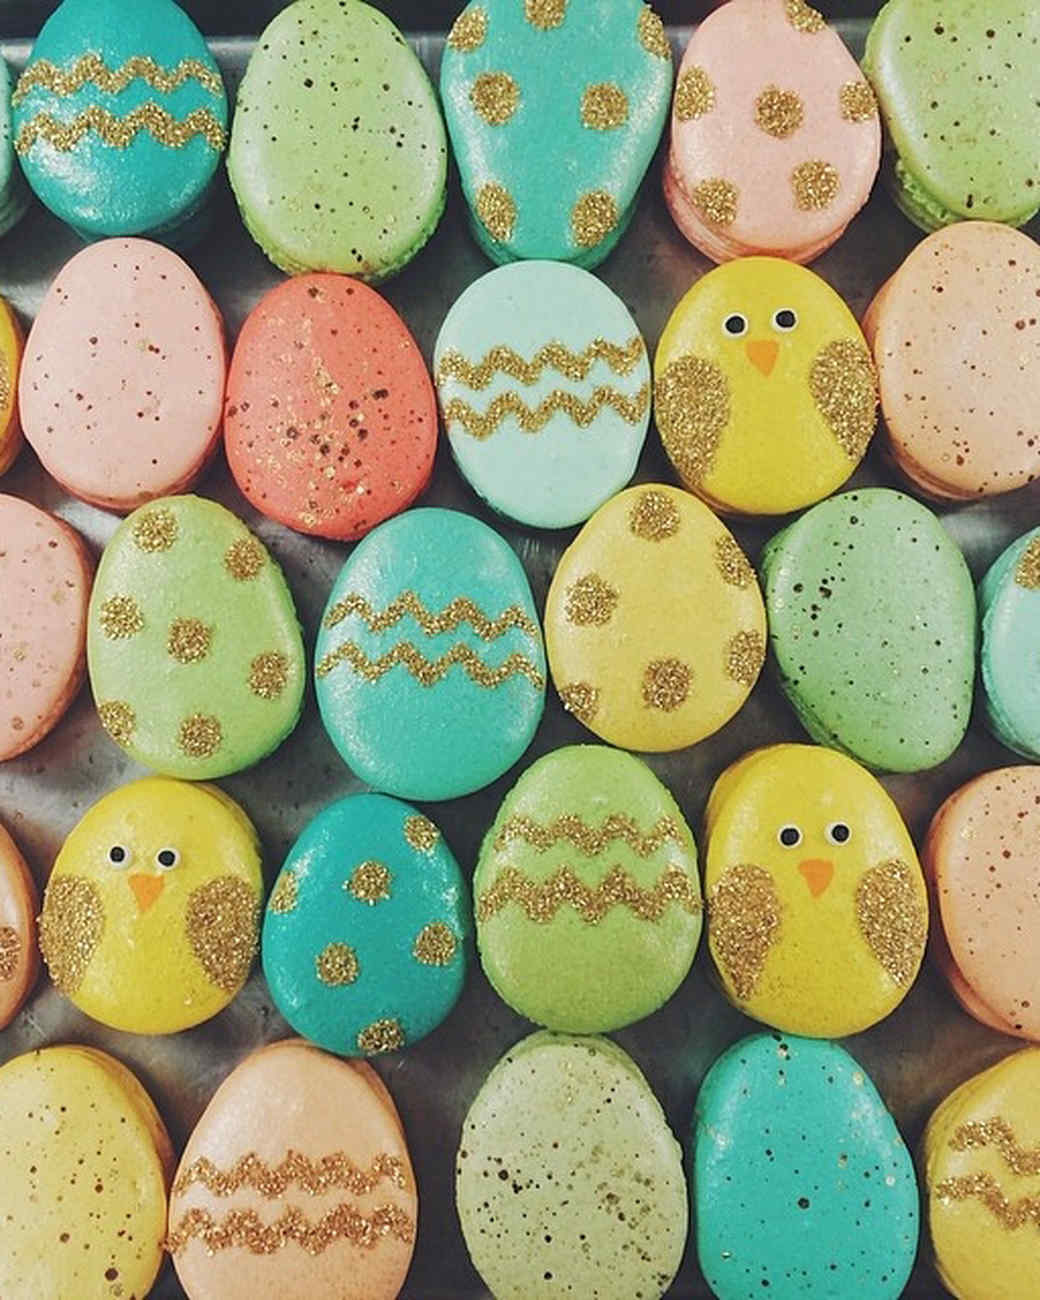 marthas-egg-hunt-sweetnsaucyshop-0414.jpg